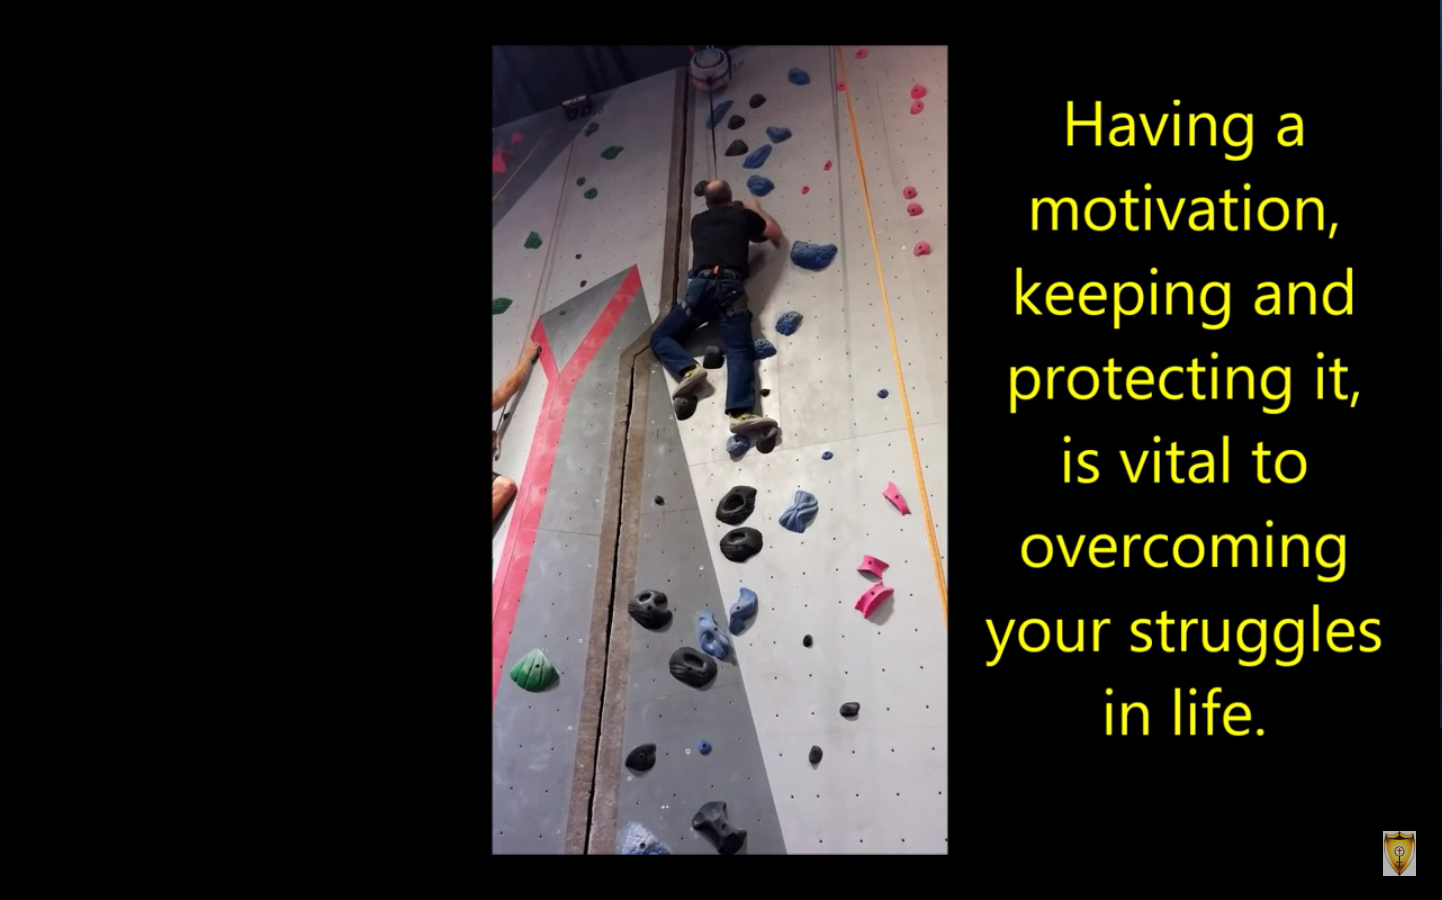 Having a motivation